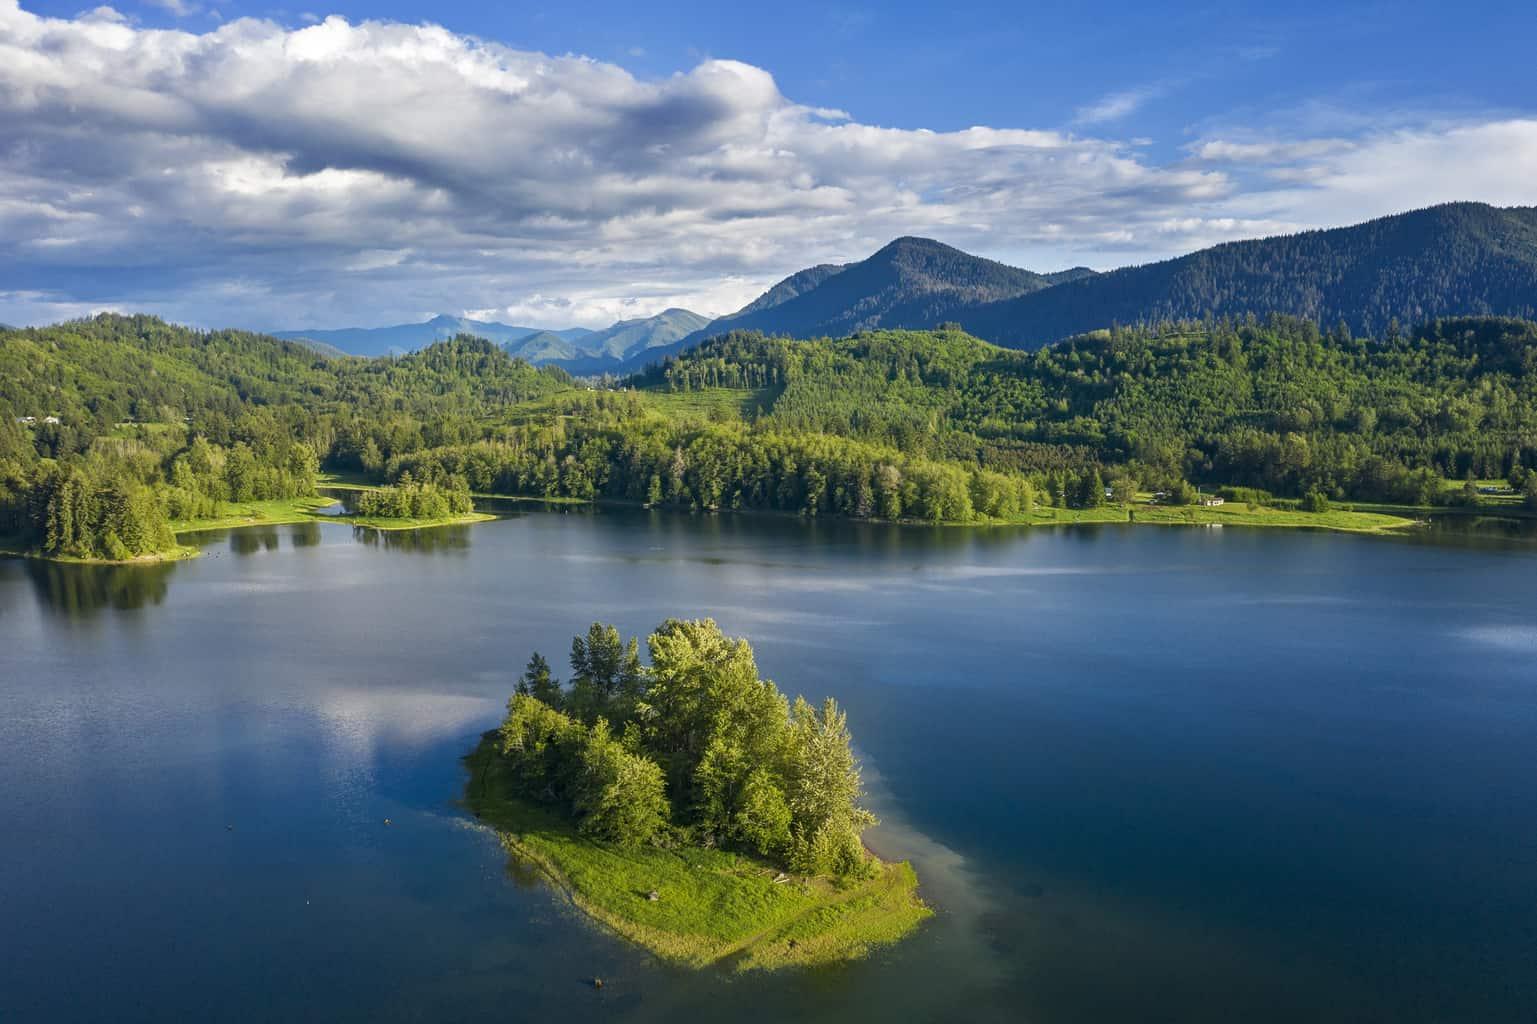 alder lake on nisqually river